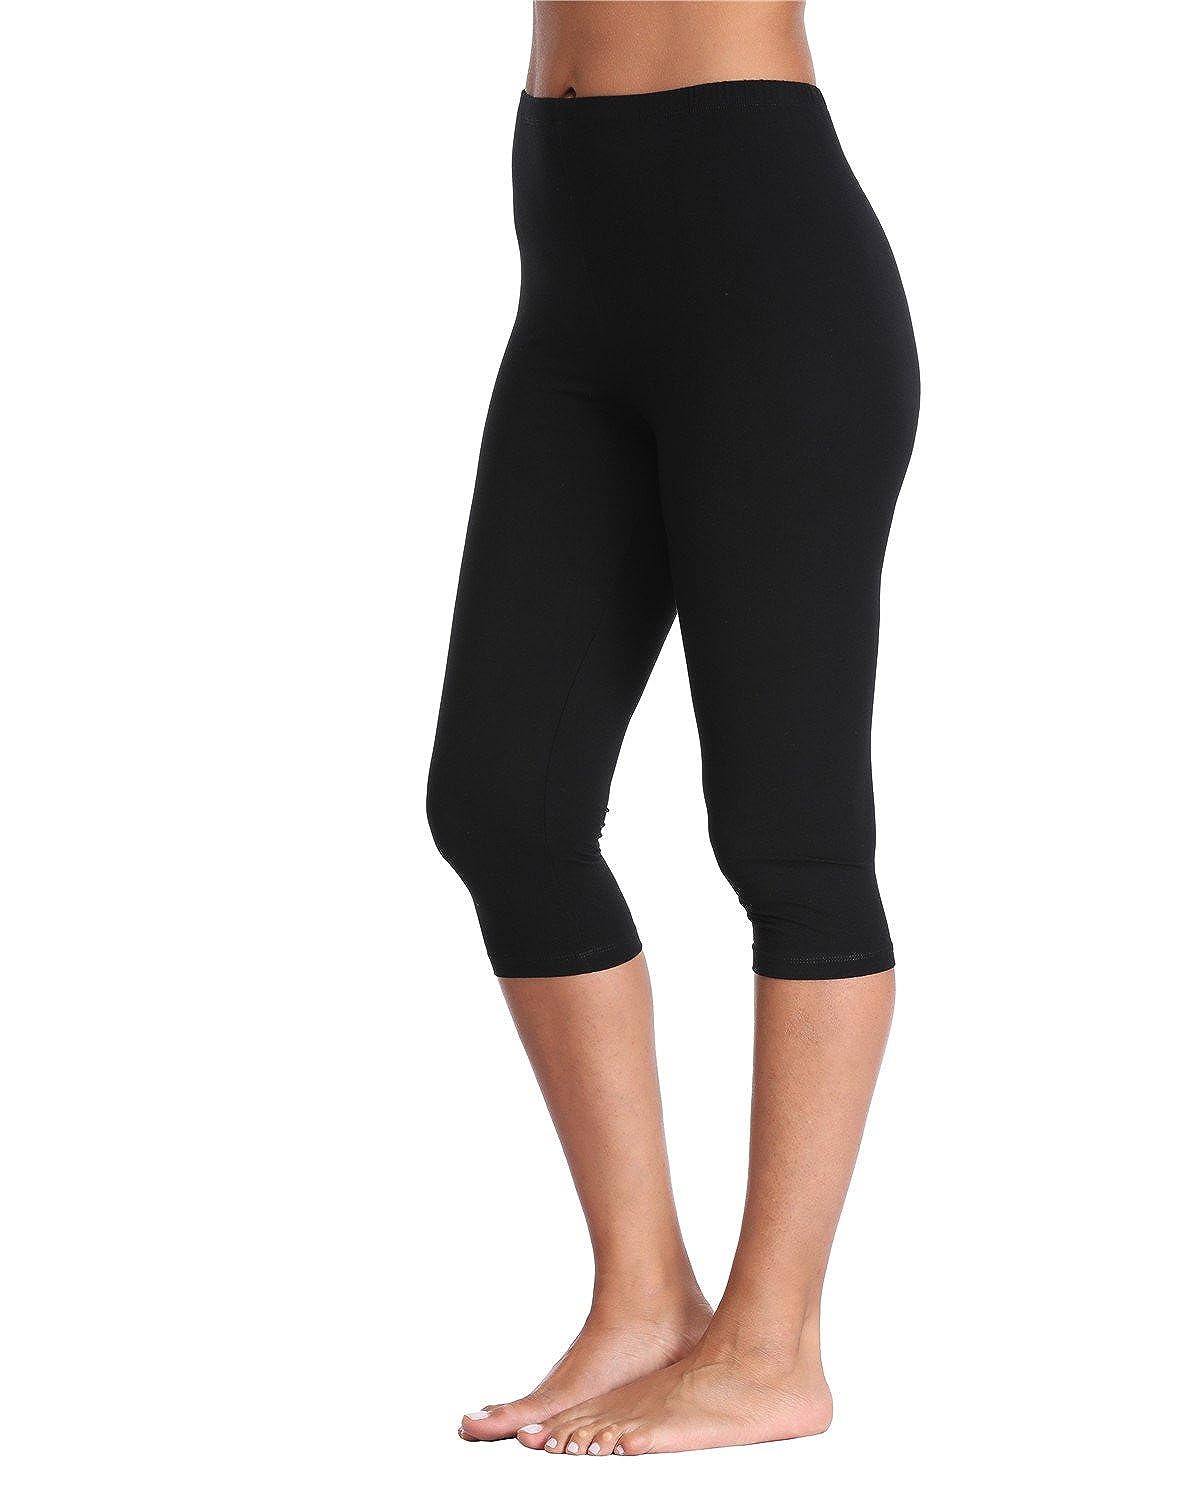 3bfec22f4 Kotii Women s Soft Capri Leggings Crop Leggings 3 4 Stretch Yoga Pants   Amazon.ca  Clothing   Accessories